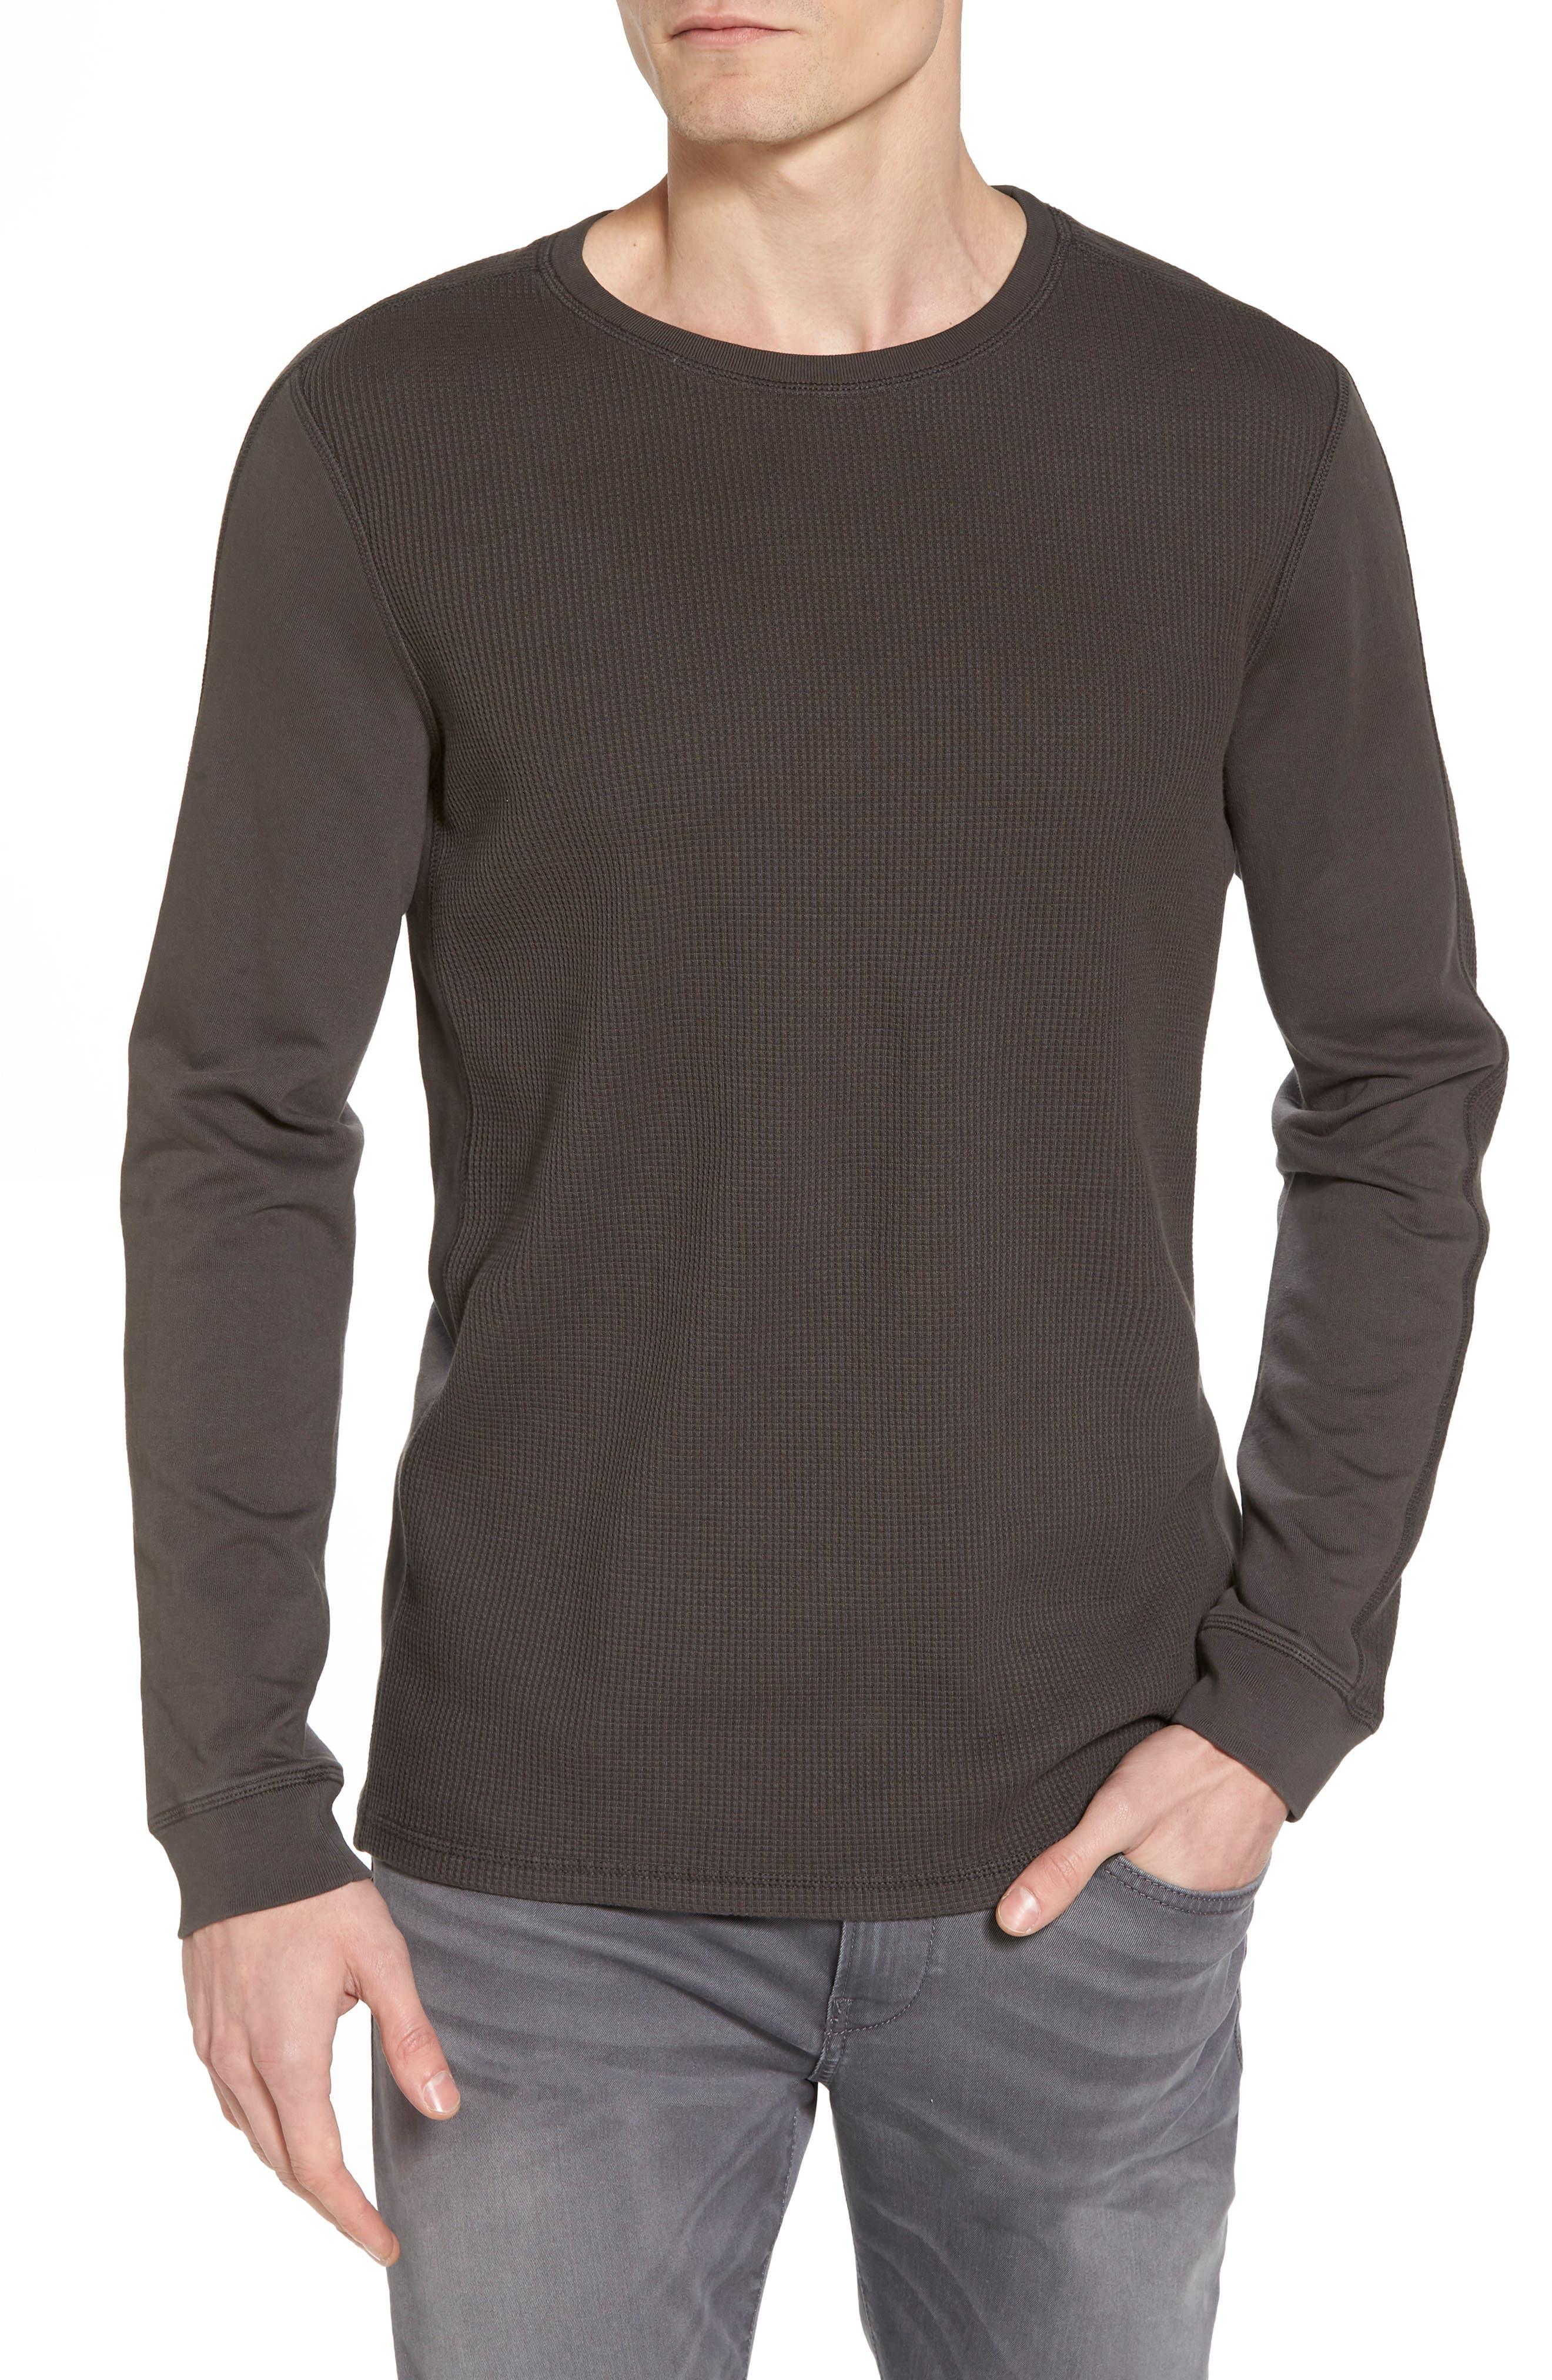 Trevor Slim Fit Crewneck Shirt,                             Main thumbnail 1, color,                             Smoke Grey